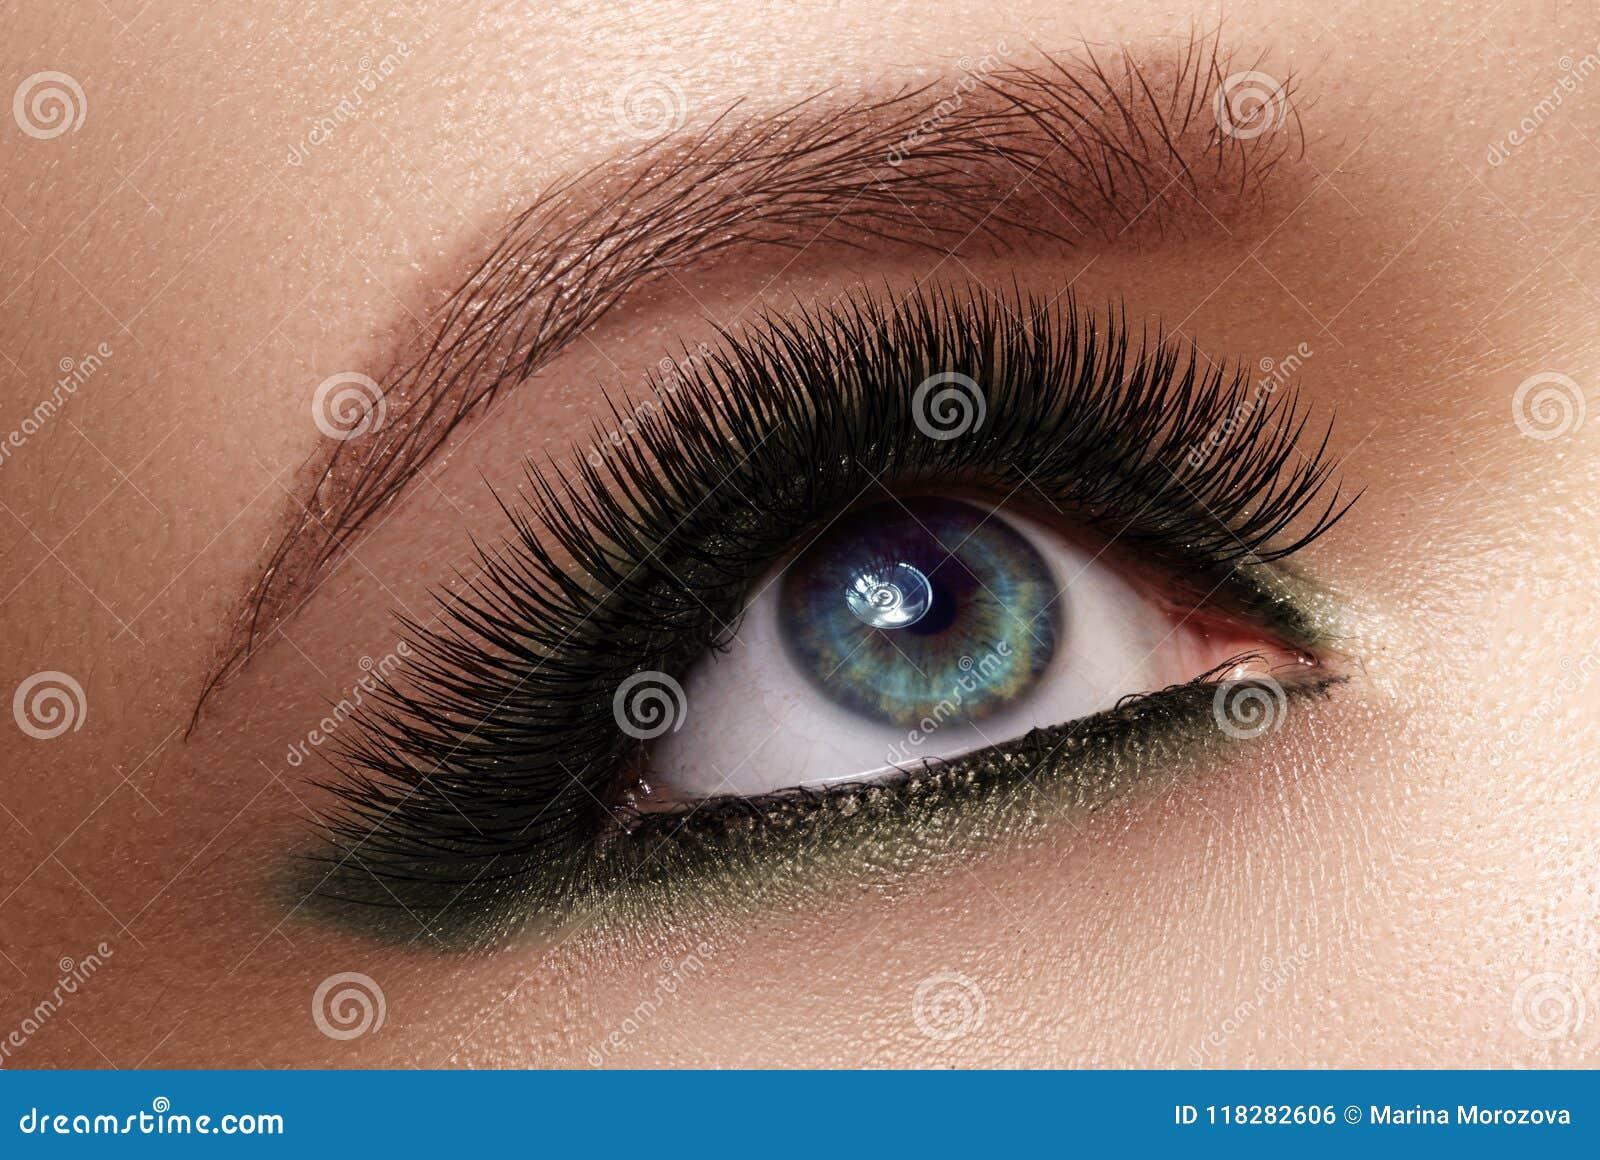 4b33a5a8473 Beautiful macro shot of female eye with extreme long eyelashes and black  liner makeup. Perfect shape make-up and long lashes. Cosmetics and make-up.  Closeup ...